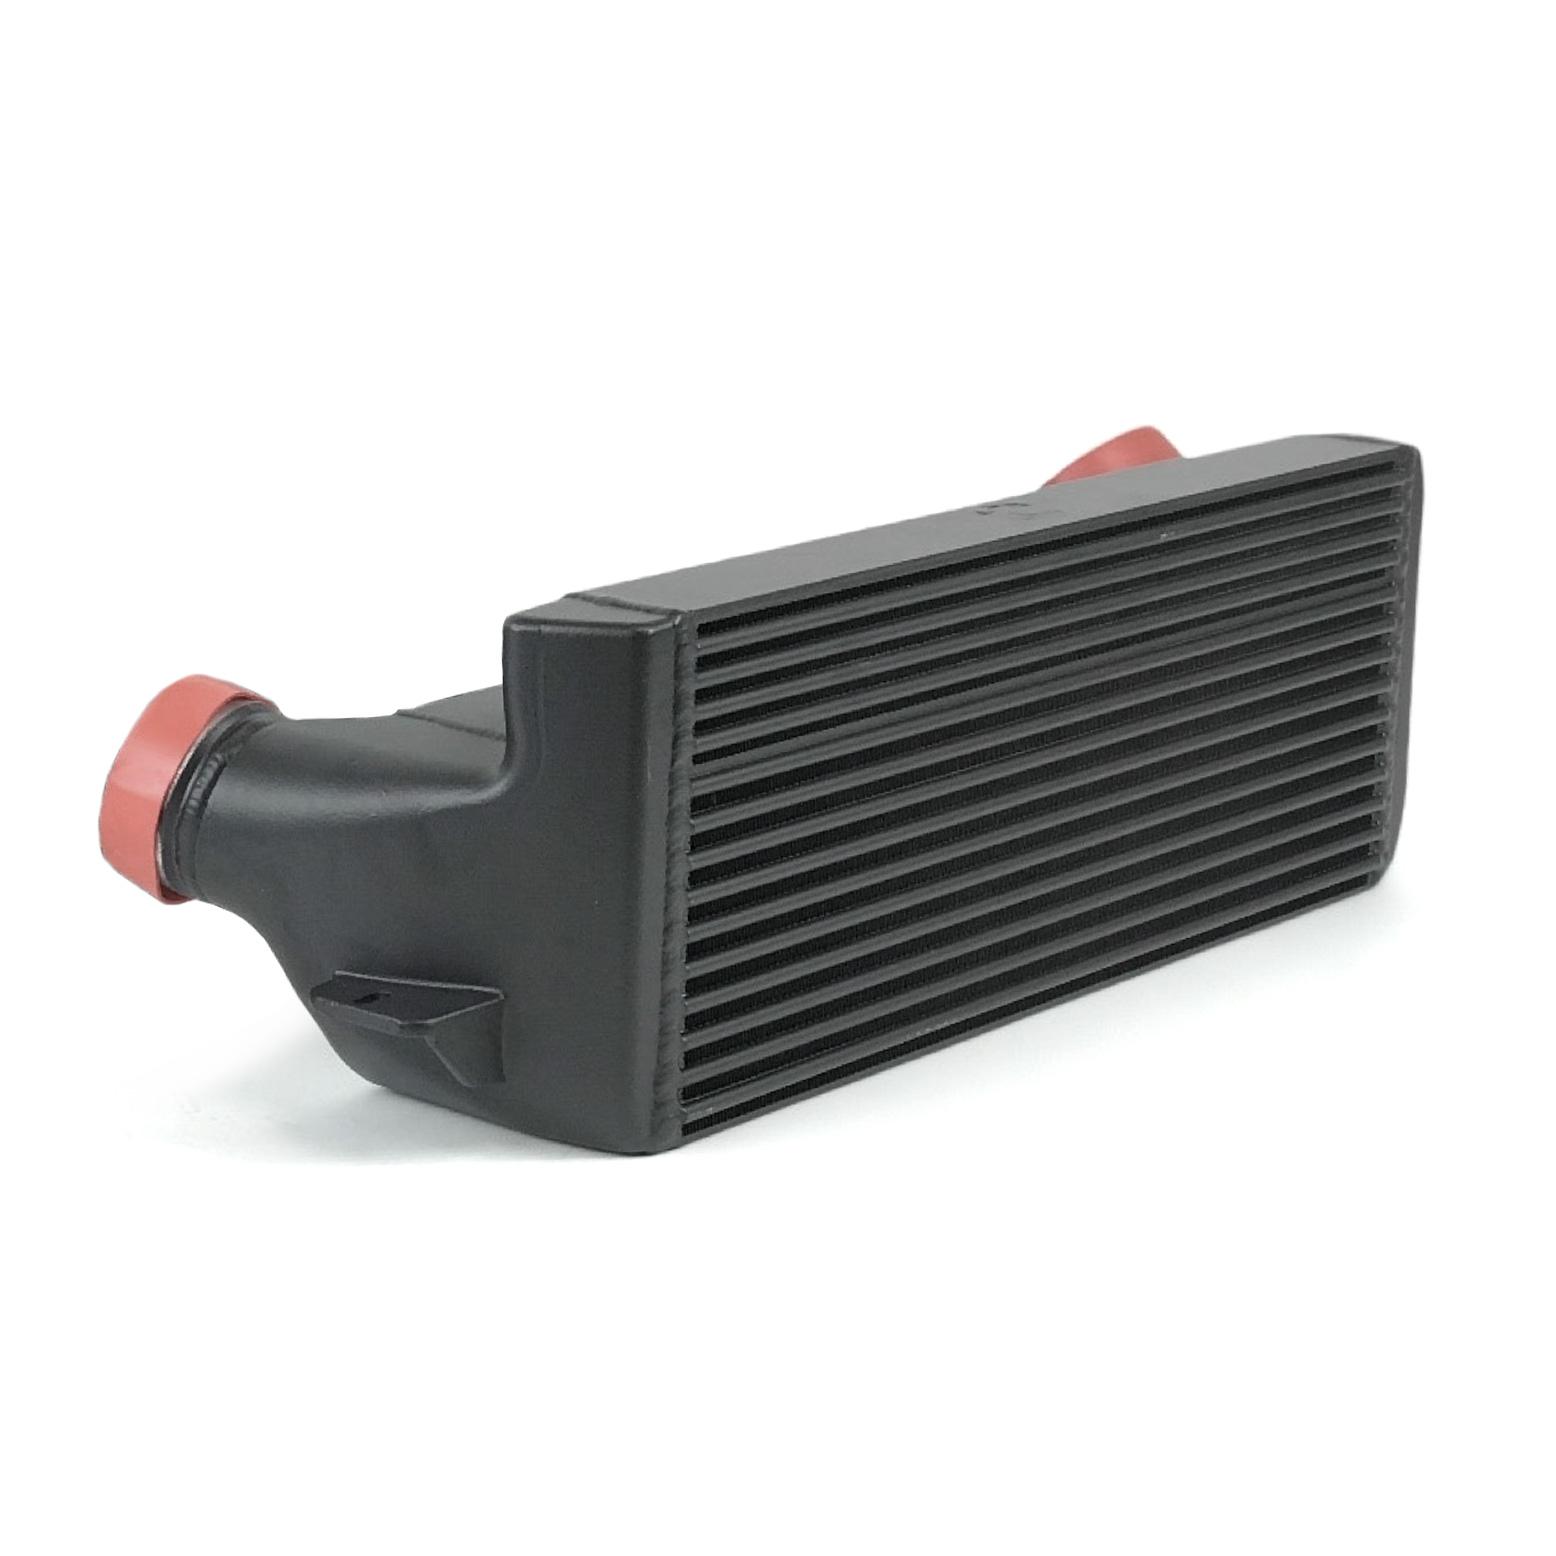 Cobb Tuning/CSF N54/N55 Front Mount Intercooler: BMW 1M 2011, 135i 2008-2013 & 335i 2007-2013 (BLACK)